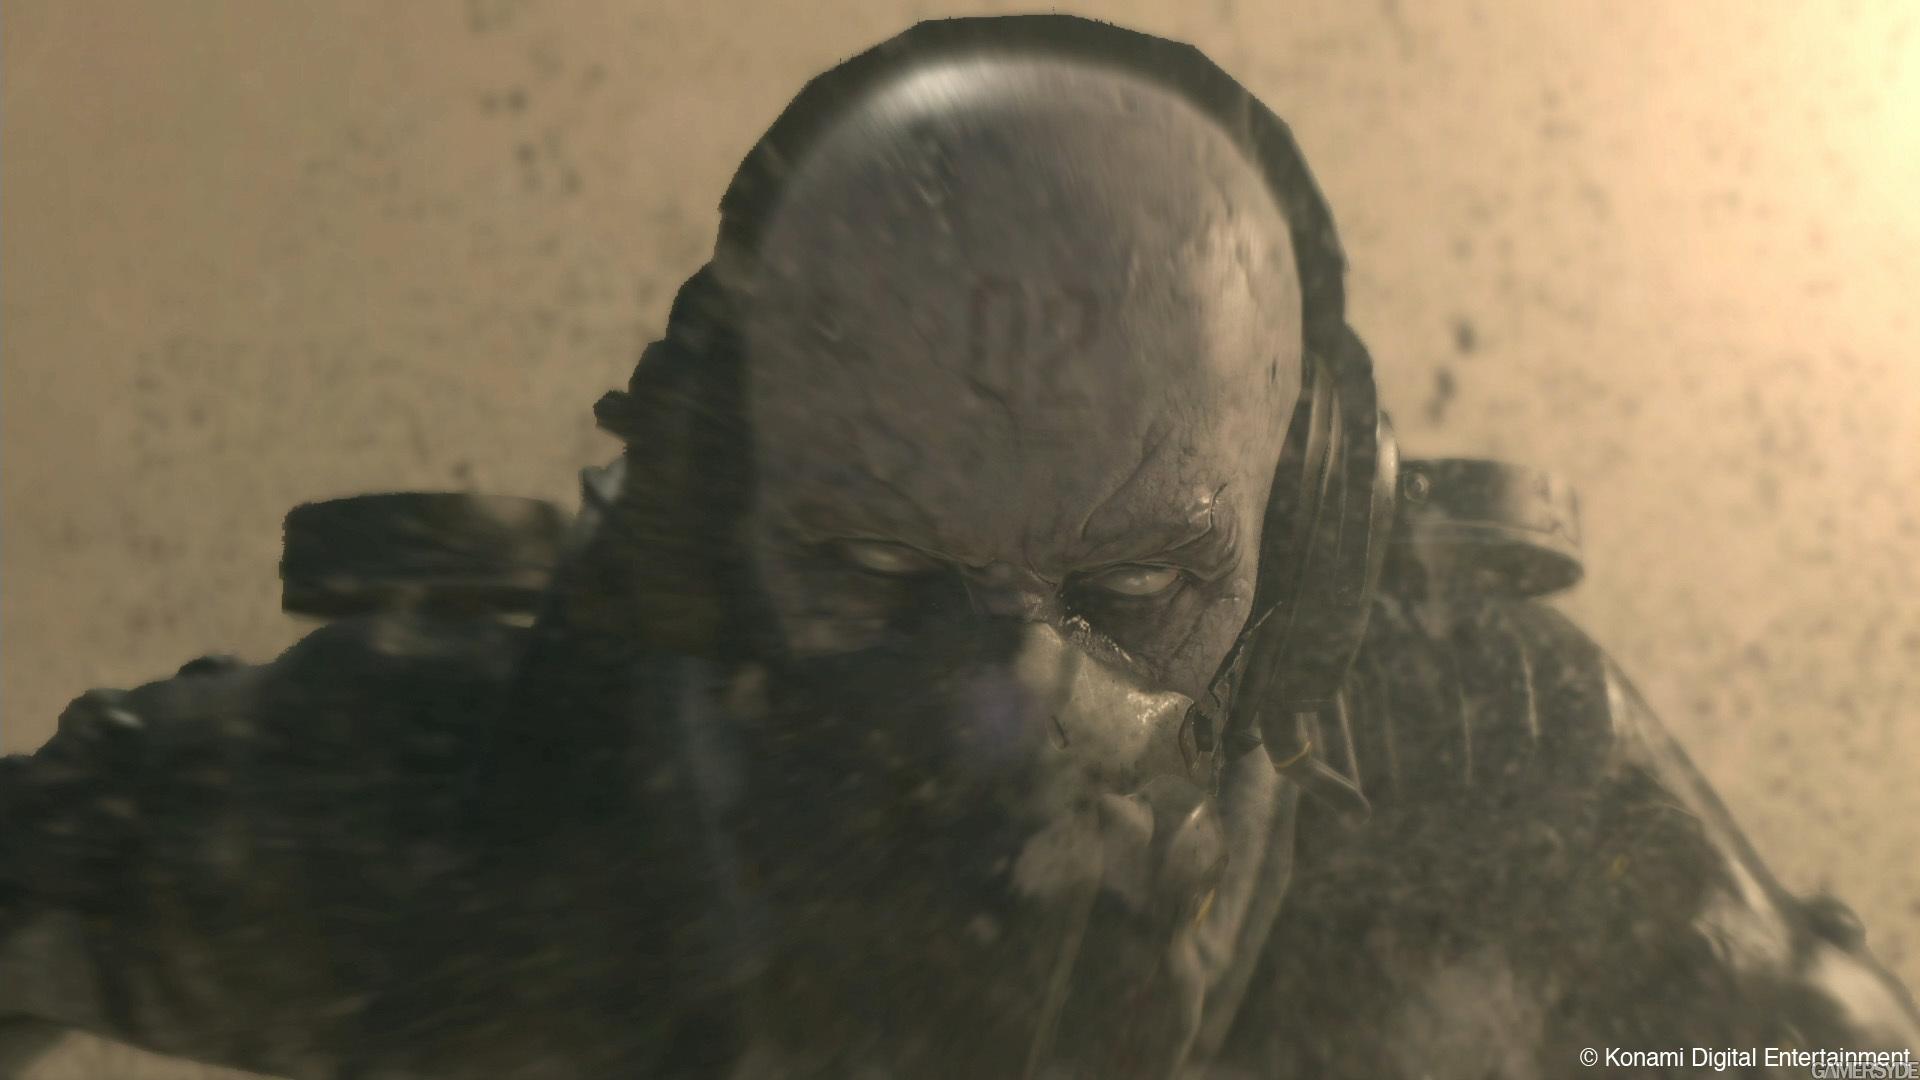 image metal gear solid v the phantom pain 22381 2584 0012 بازگشت پر سر و صدای مار بی صدا ! | تحلیل و بررسی نمایش Metal Gear Solid V : The Phantom Pain در نمایشگاه E3 2013